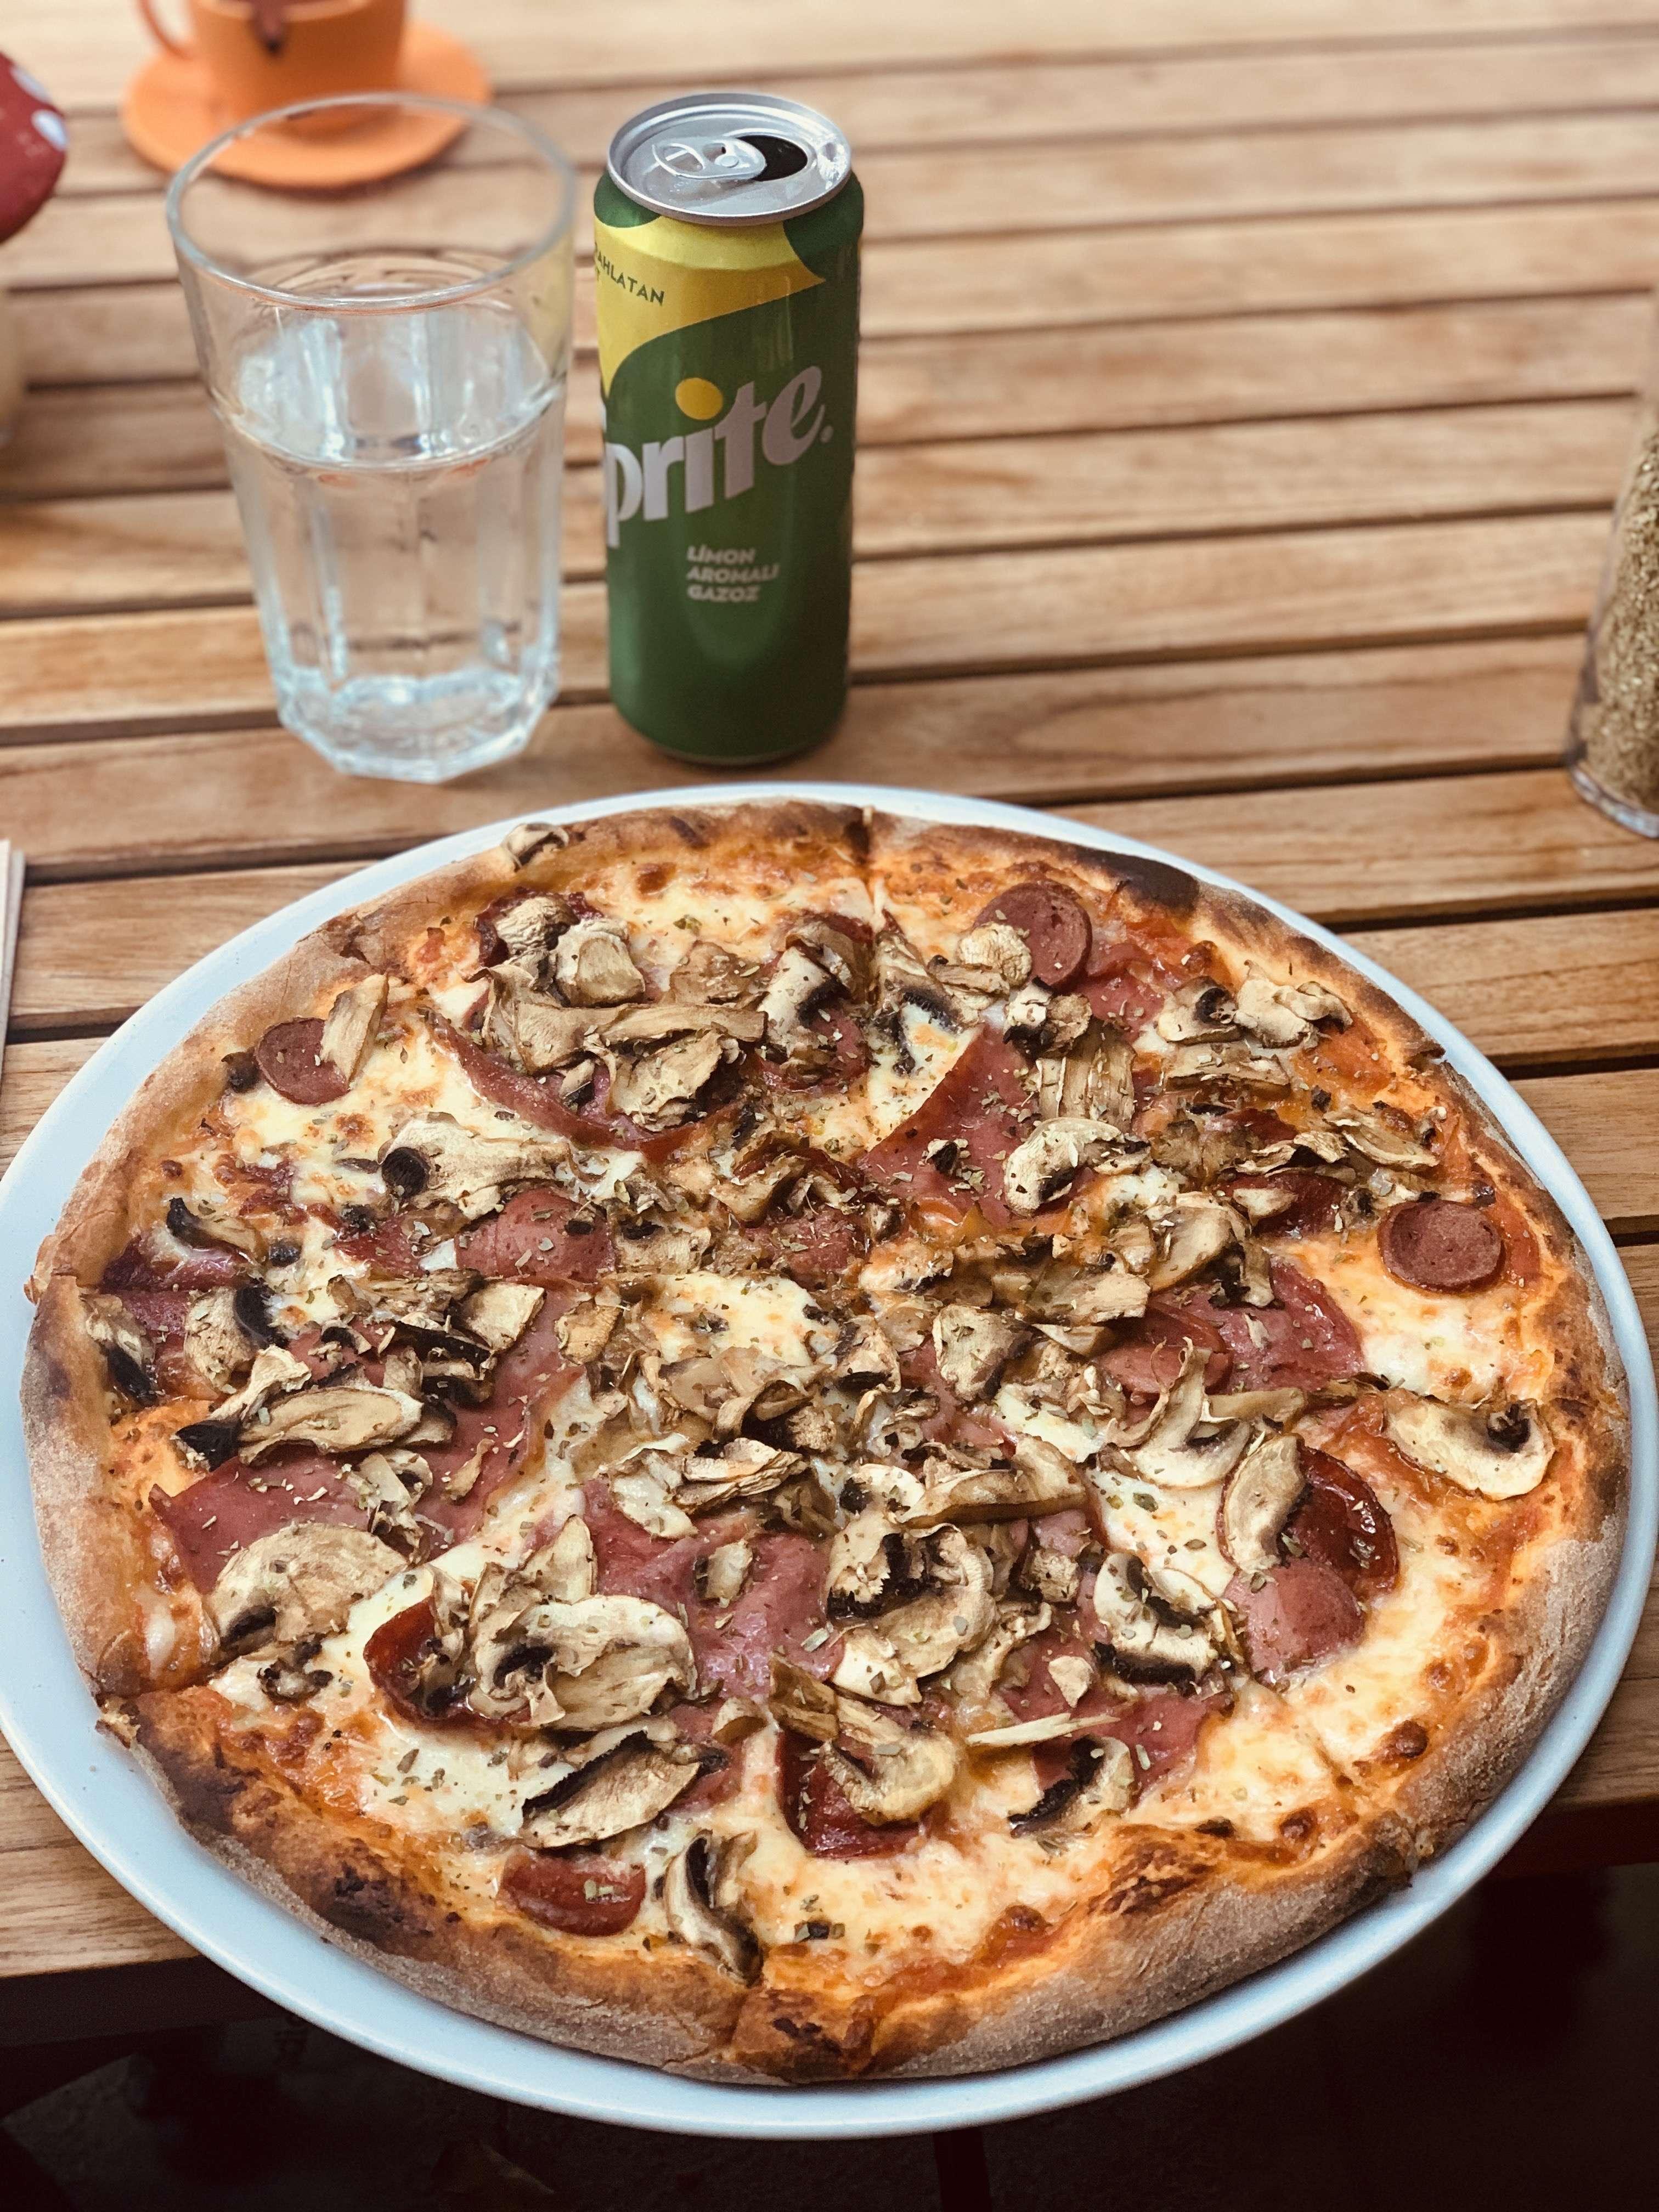 Olivia's Pizzeria